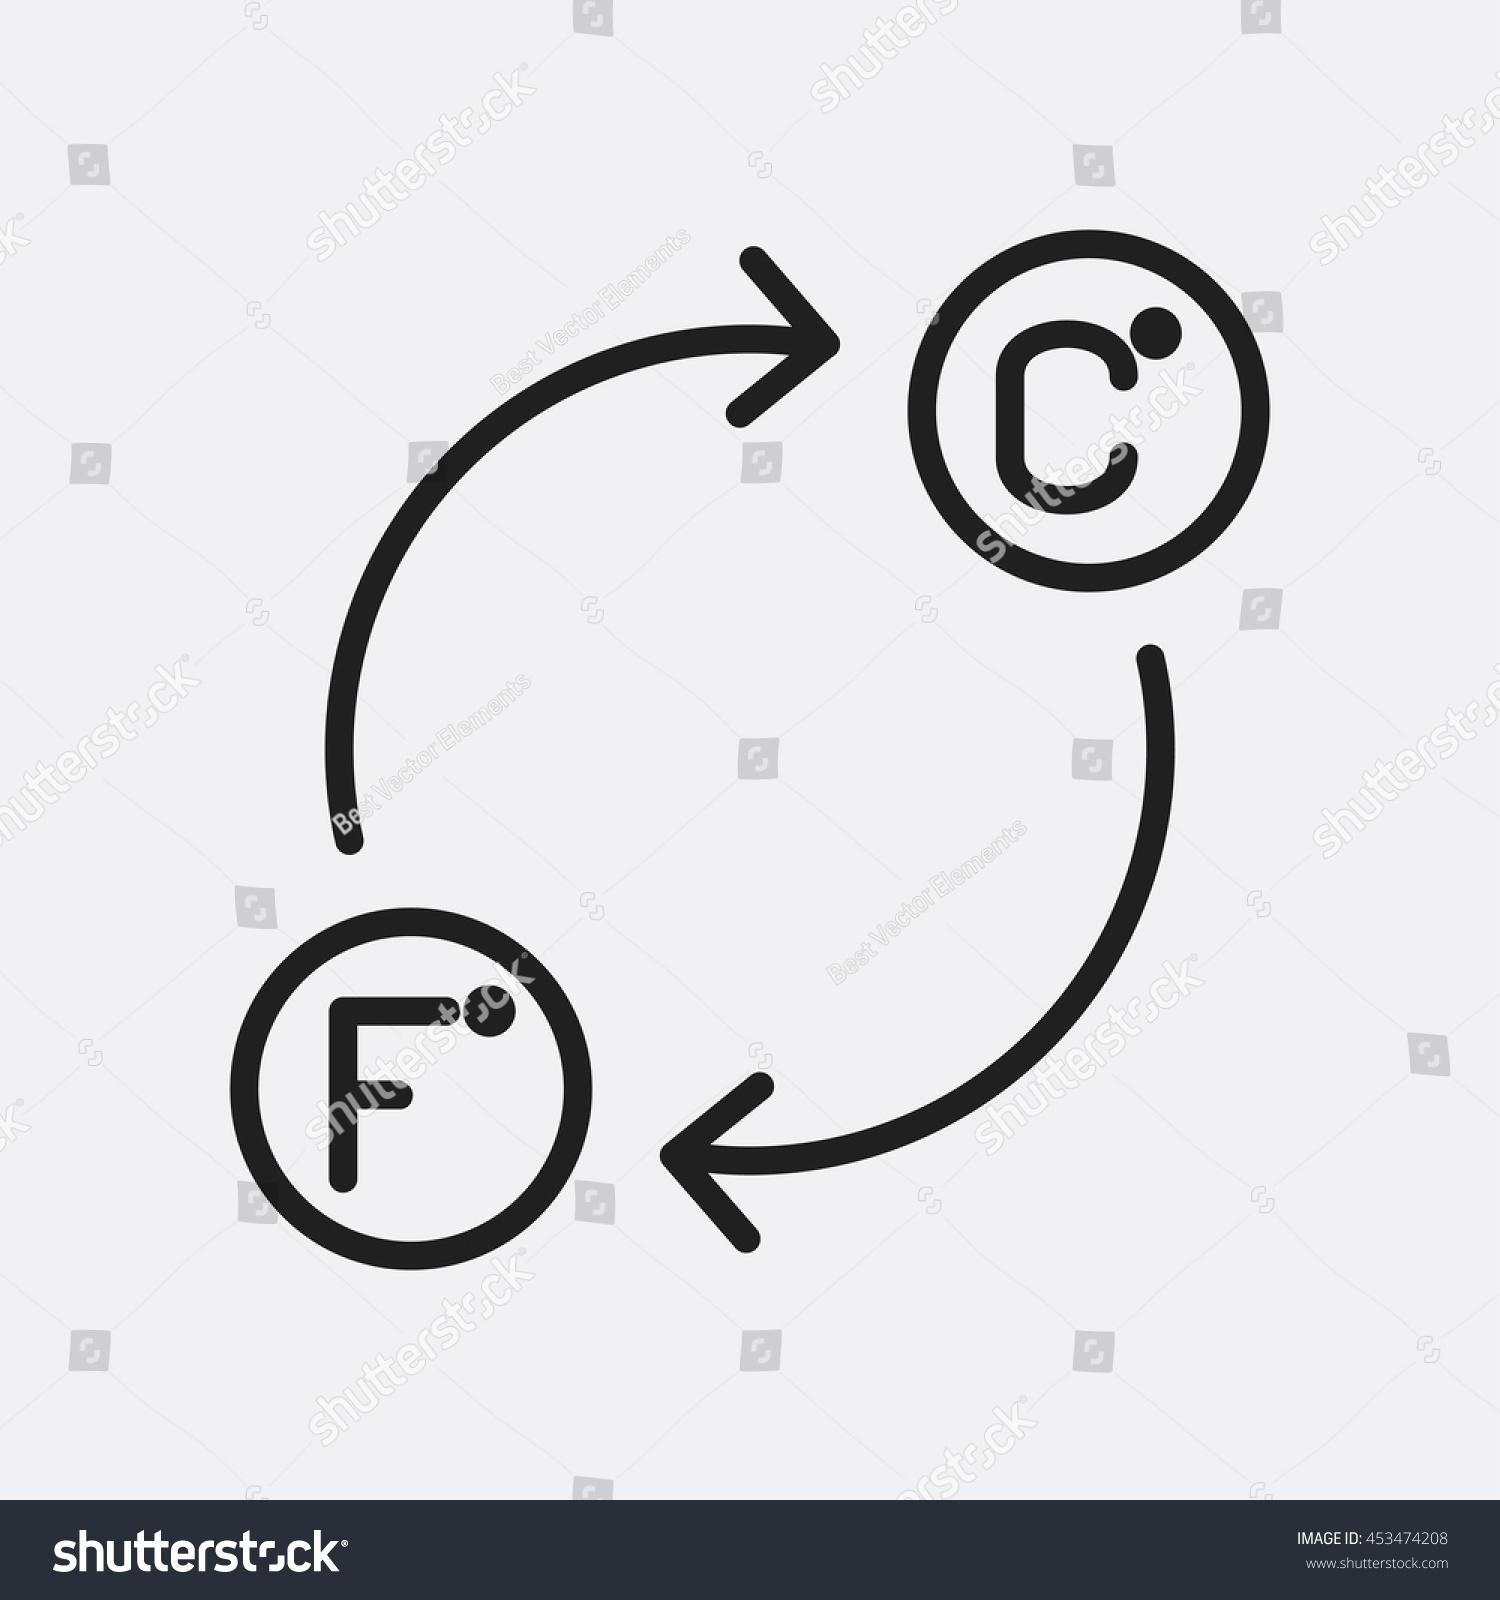 Celsius fahrenheit icon illustration isolated vector stock vector celsius and fahrenheit icon illustration isolated vector sign symbol biocorpaavc Choice Image